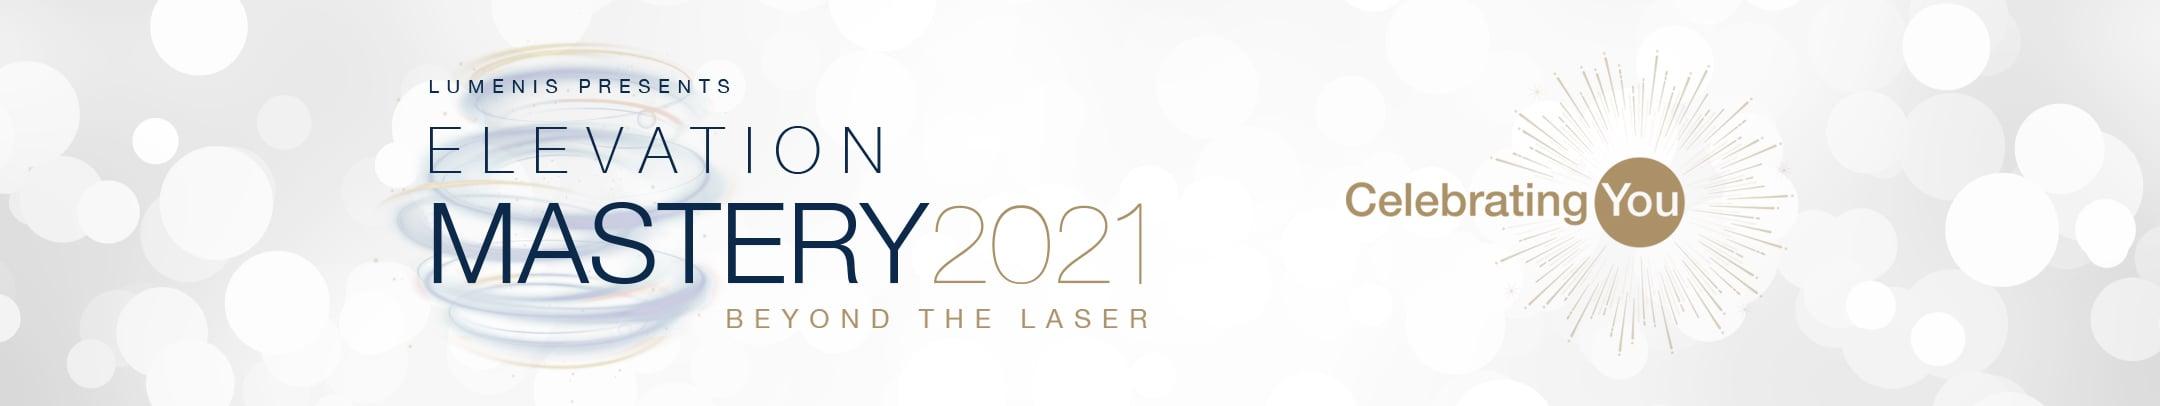 ELEVATION MASTERY WEB HEADER 2021-1